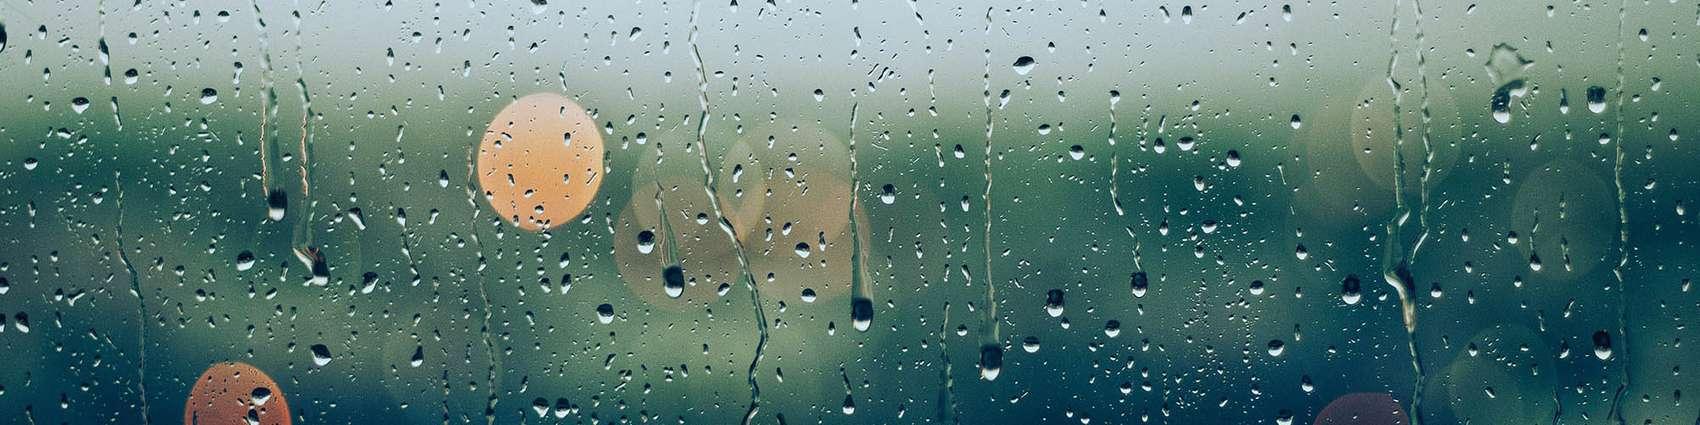 regnvejr paa ferien